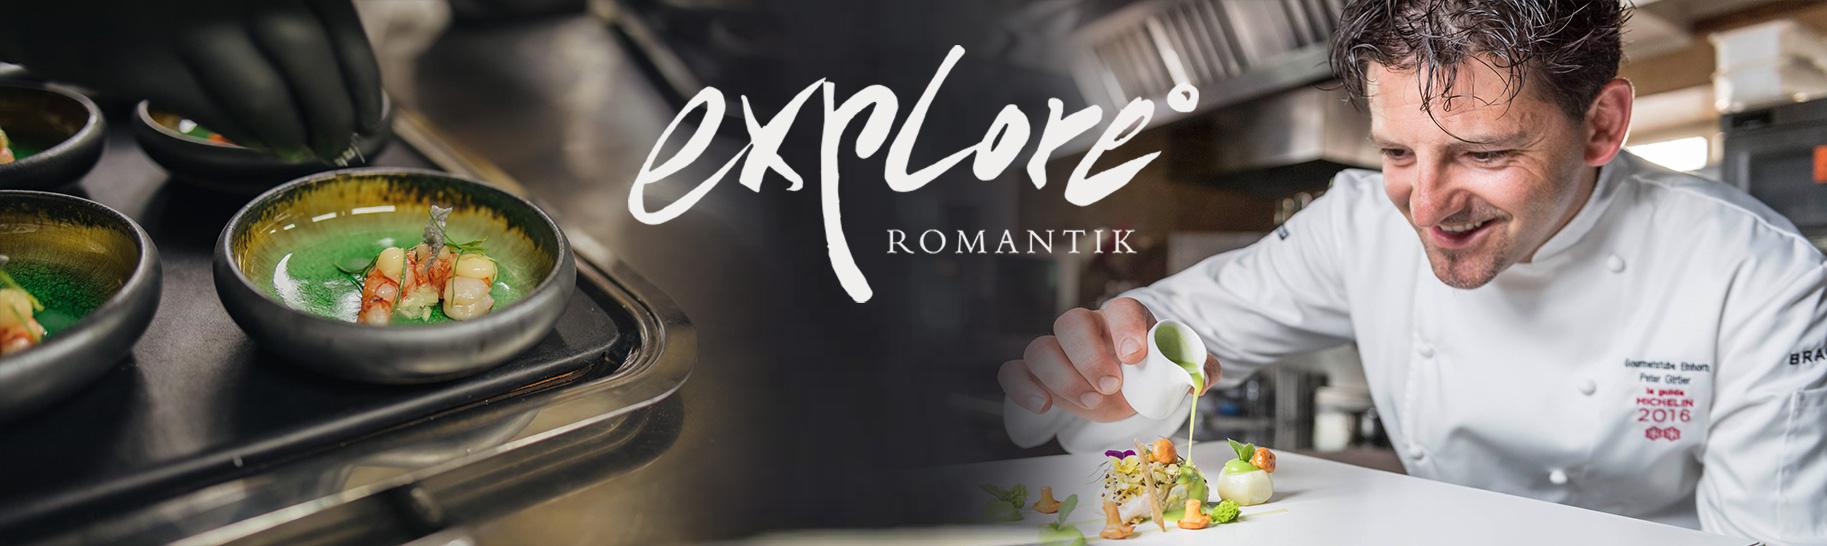 Romantik Hotel Stafler Explore Romantik Footer